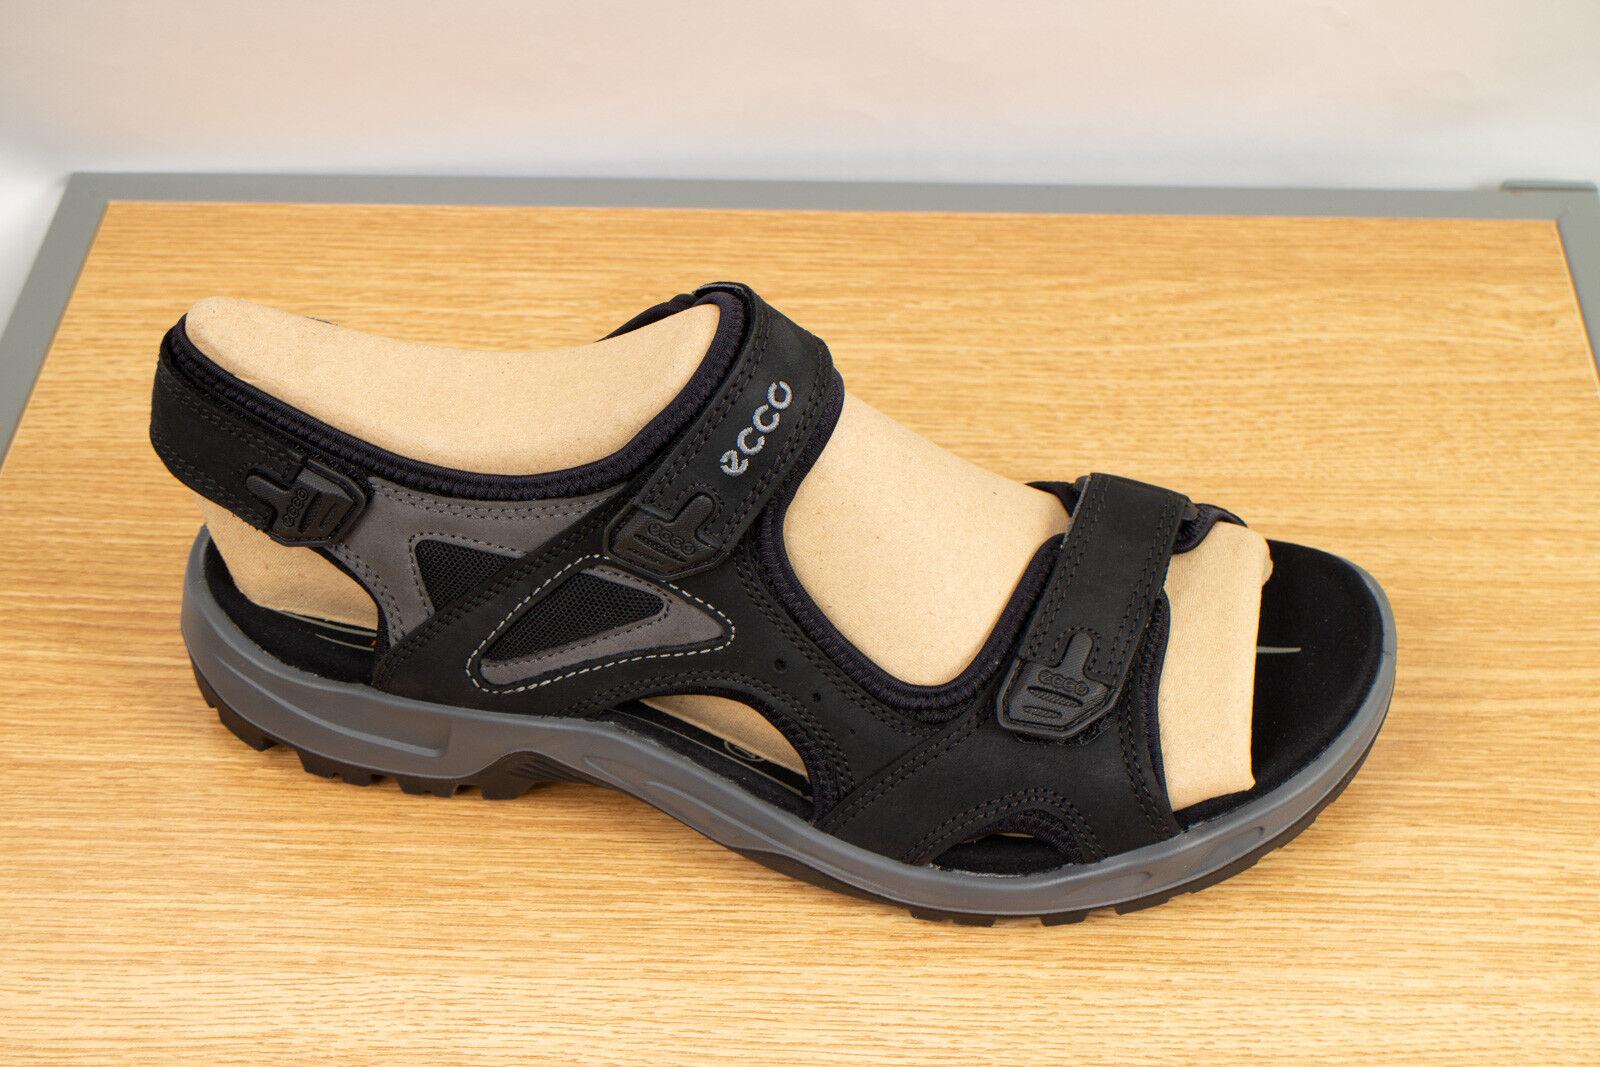 ECCO Men's Offroad Sandals Yucatan Leather - nero Dark Shadow Sz EU 48 USA 14